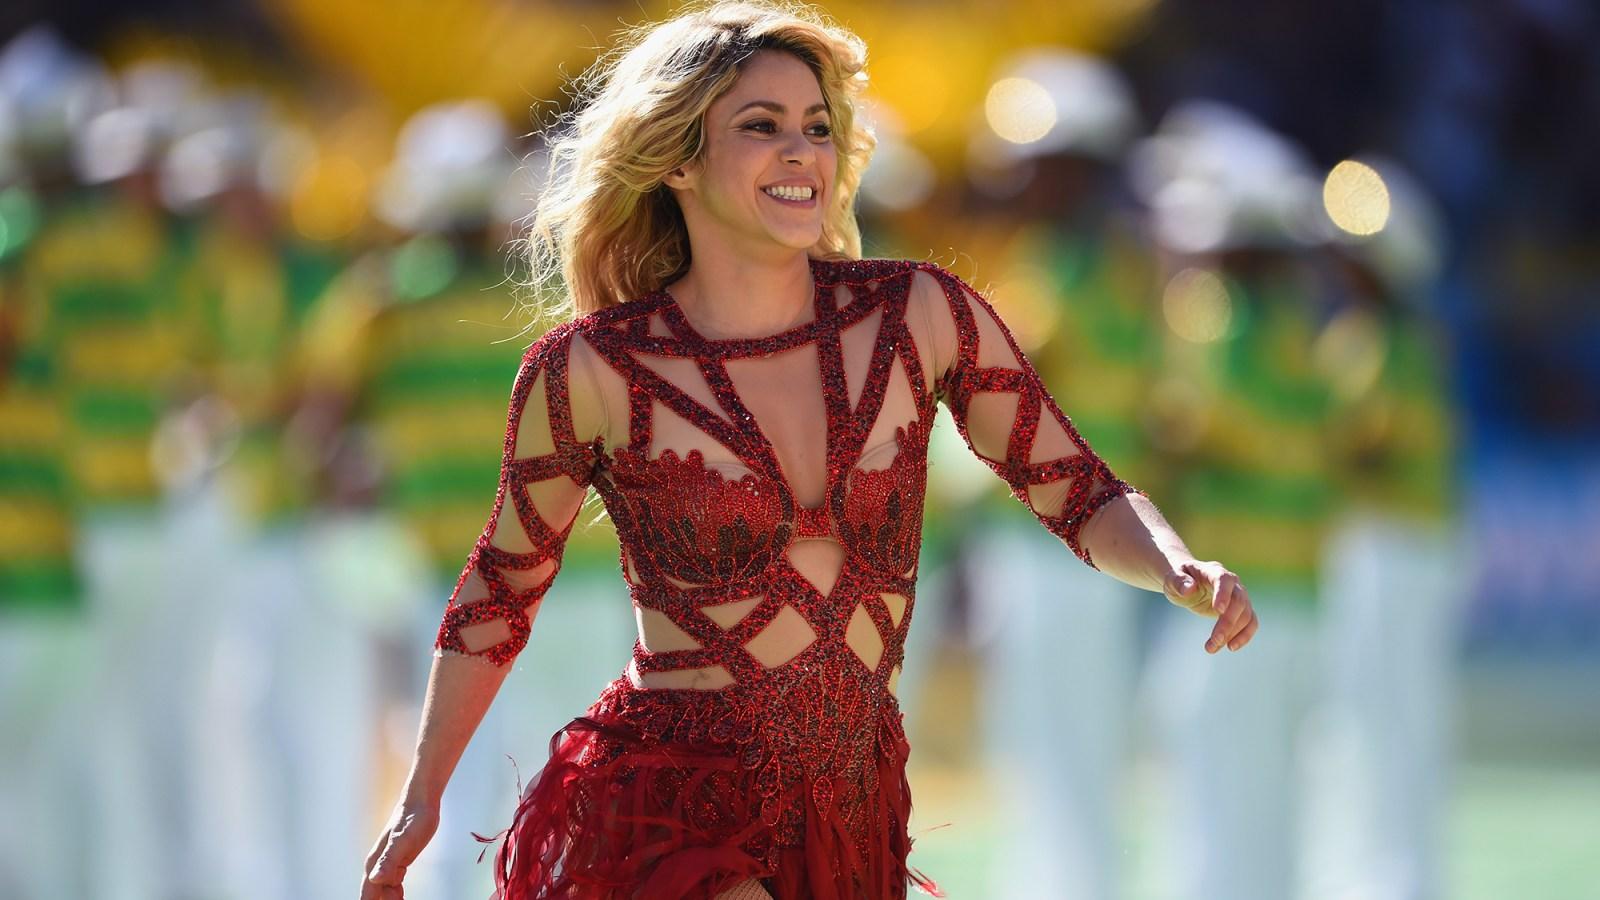 Шакира вака вака, Shakira - Waka Waka (FifaWorld Cup) - скачать 24 фотография